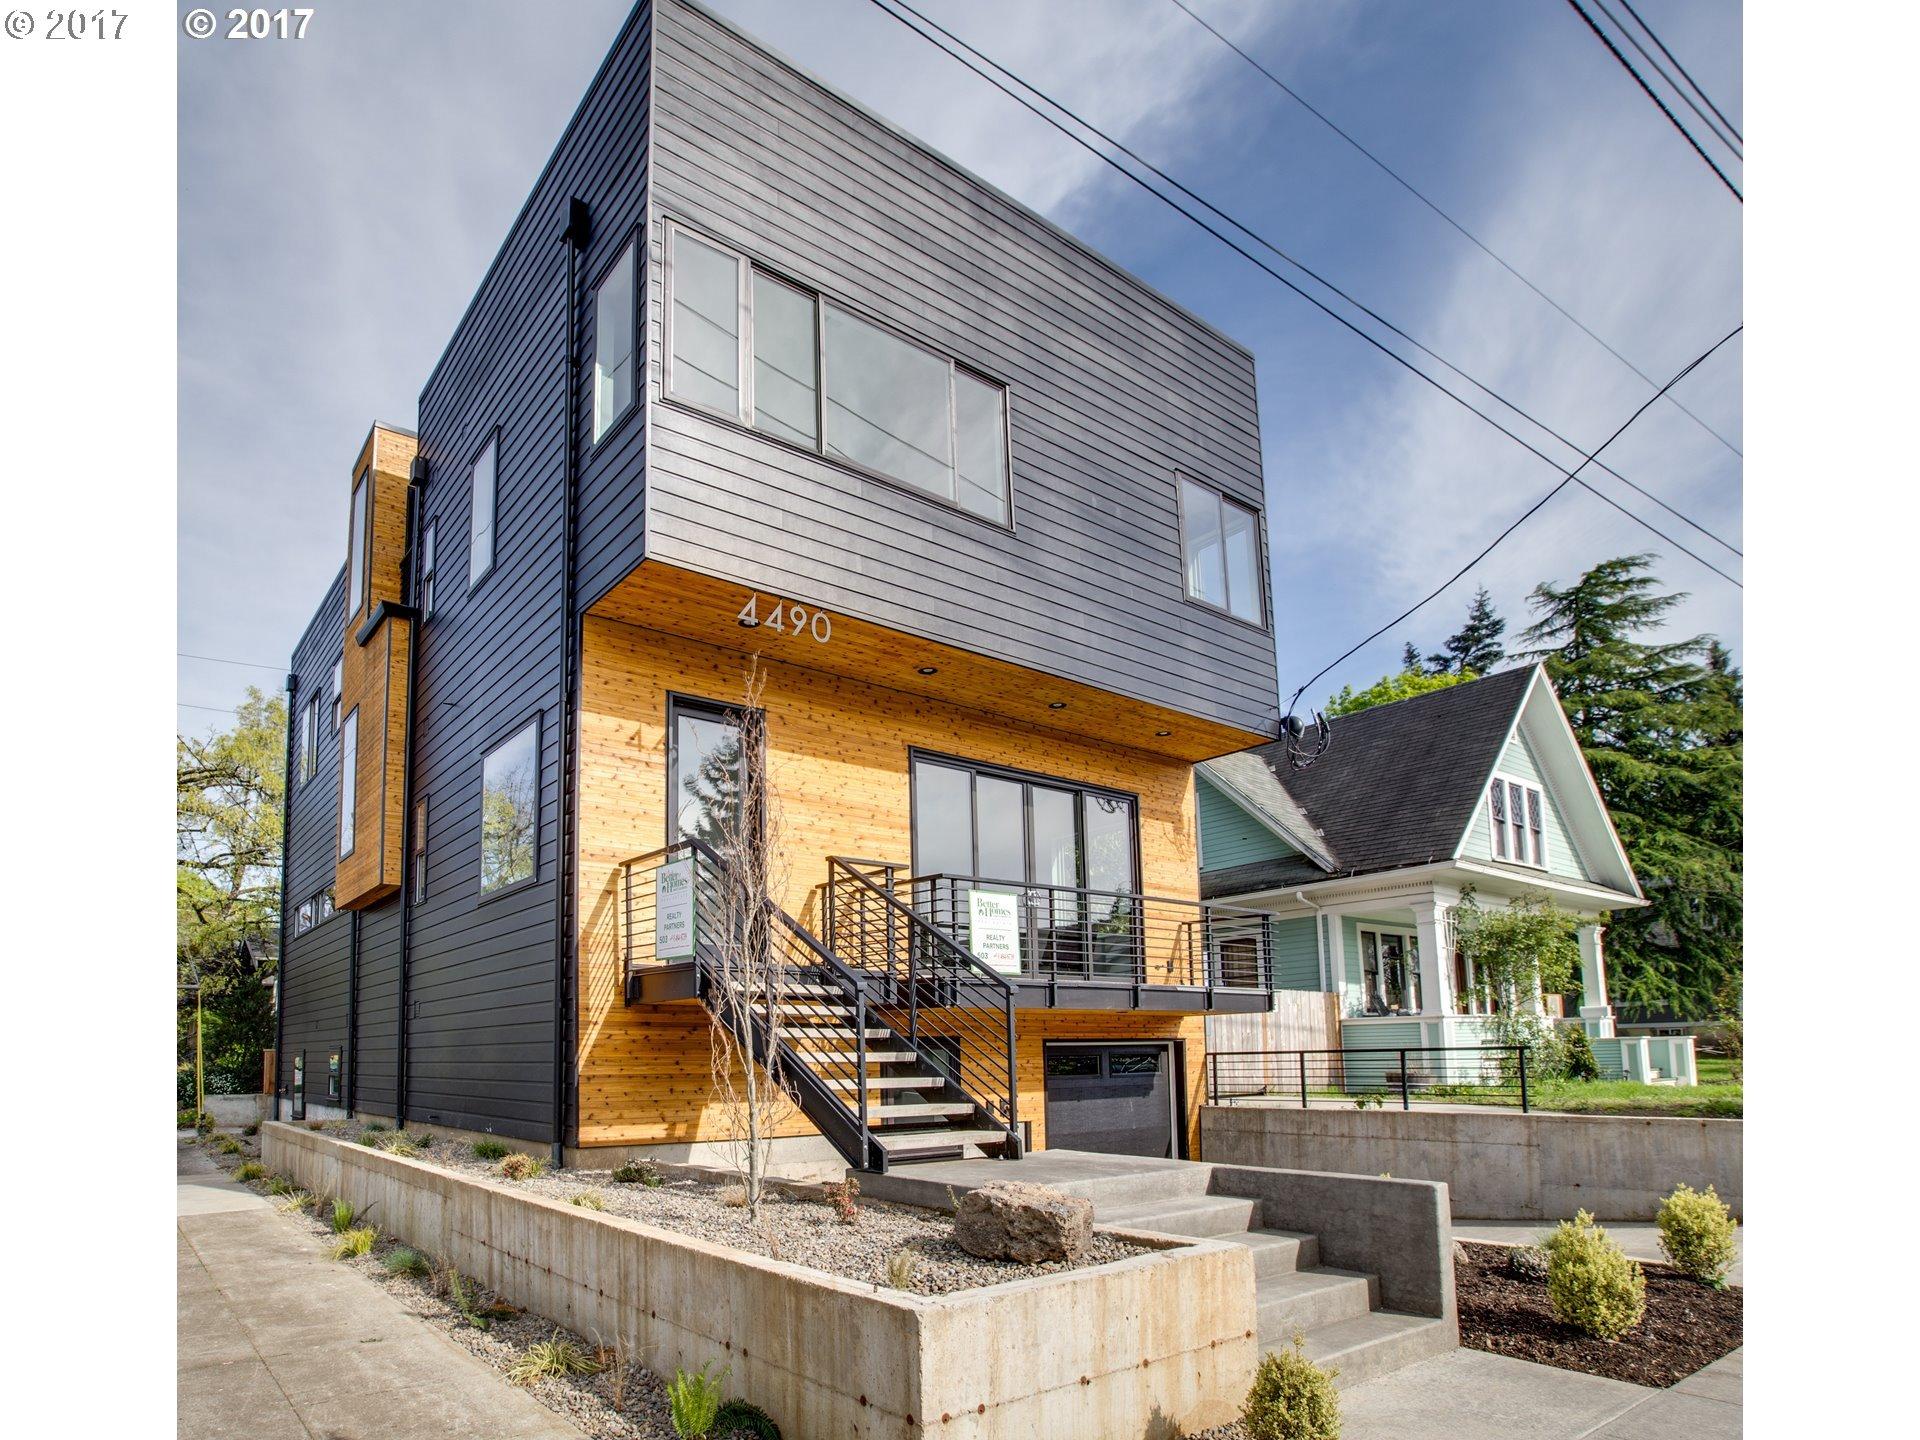 4490 NE 18TH AVE, Portland OR 97211